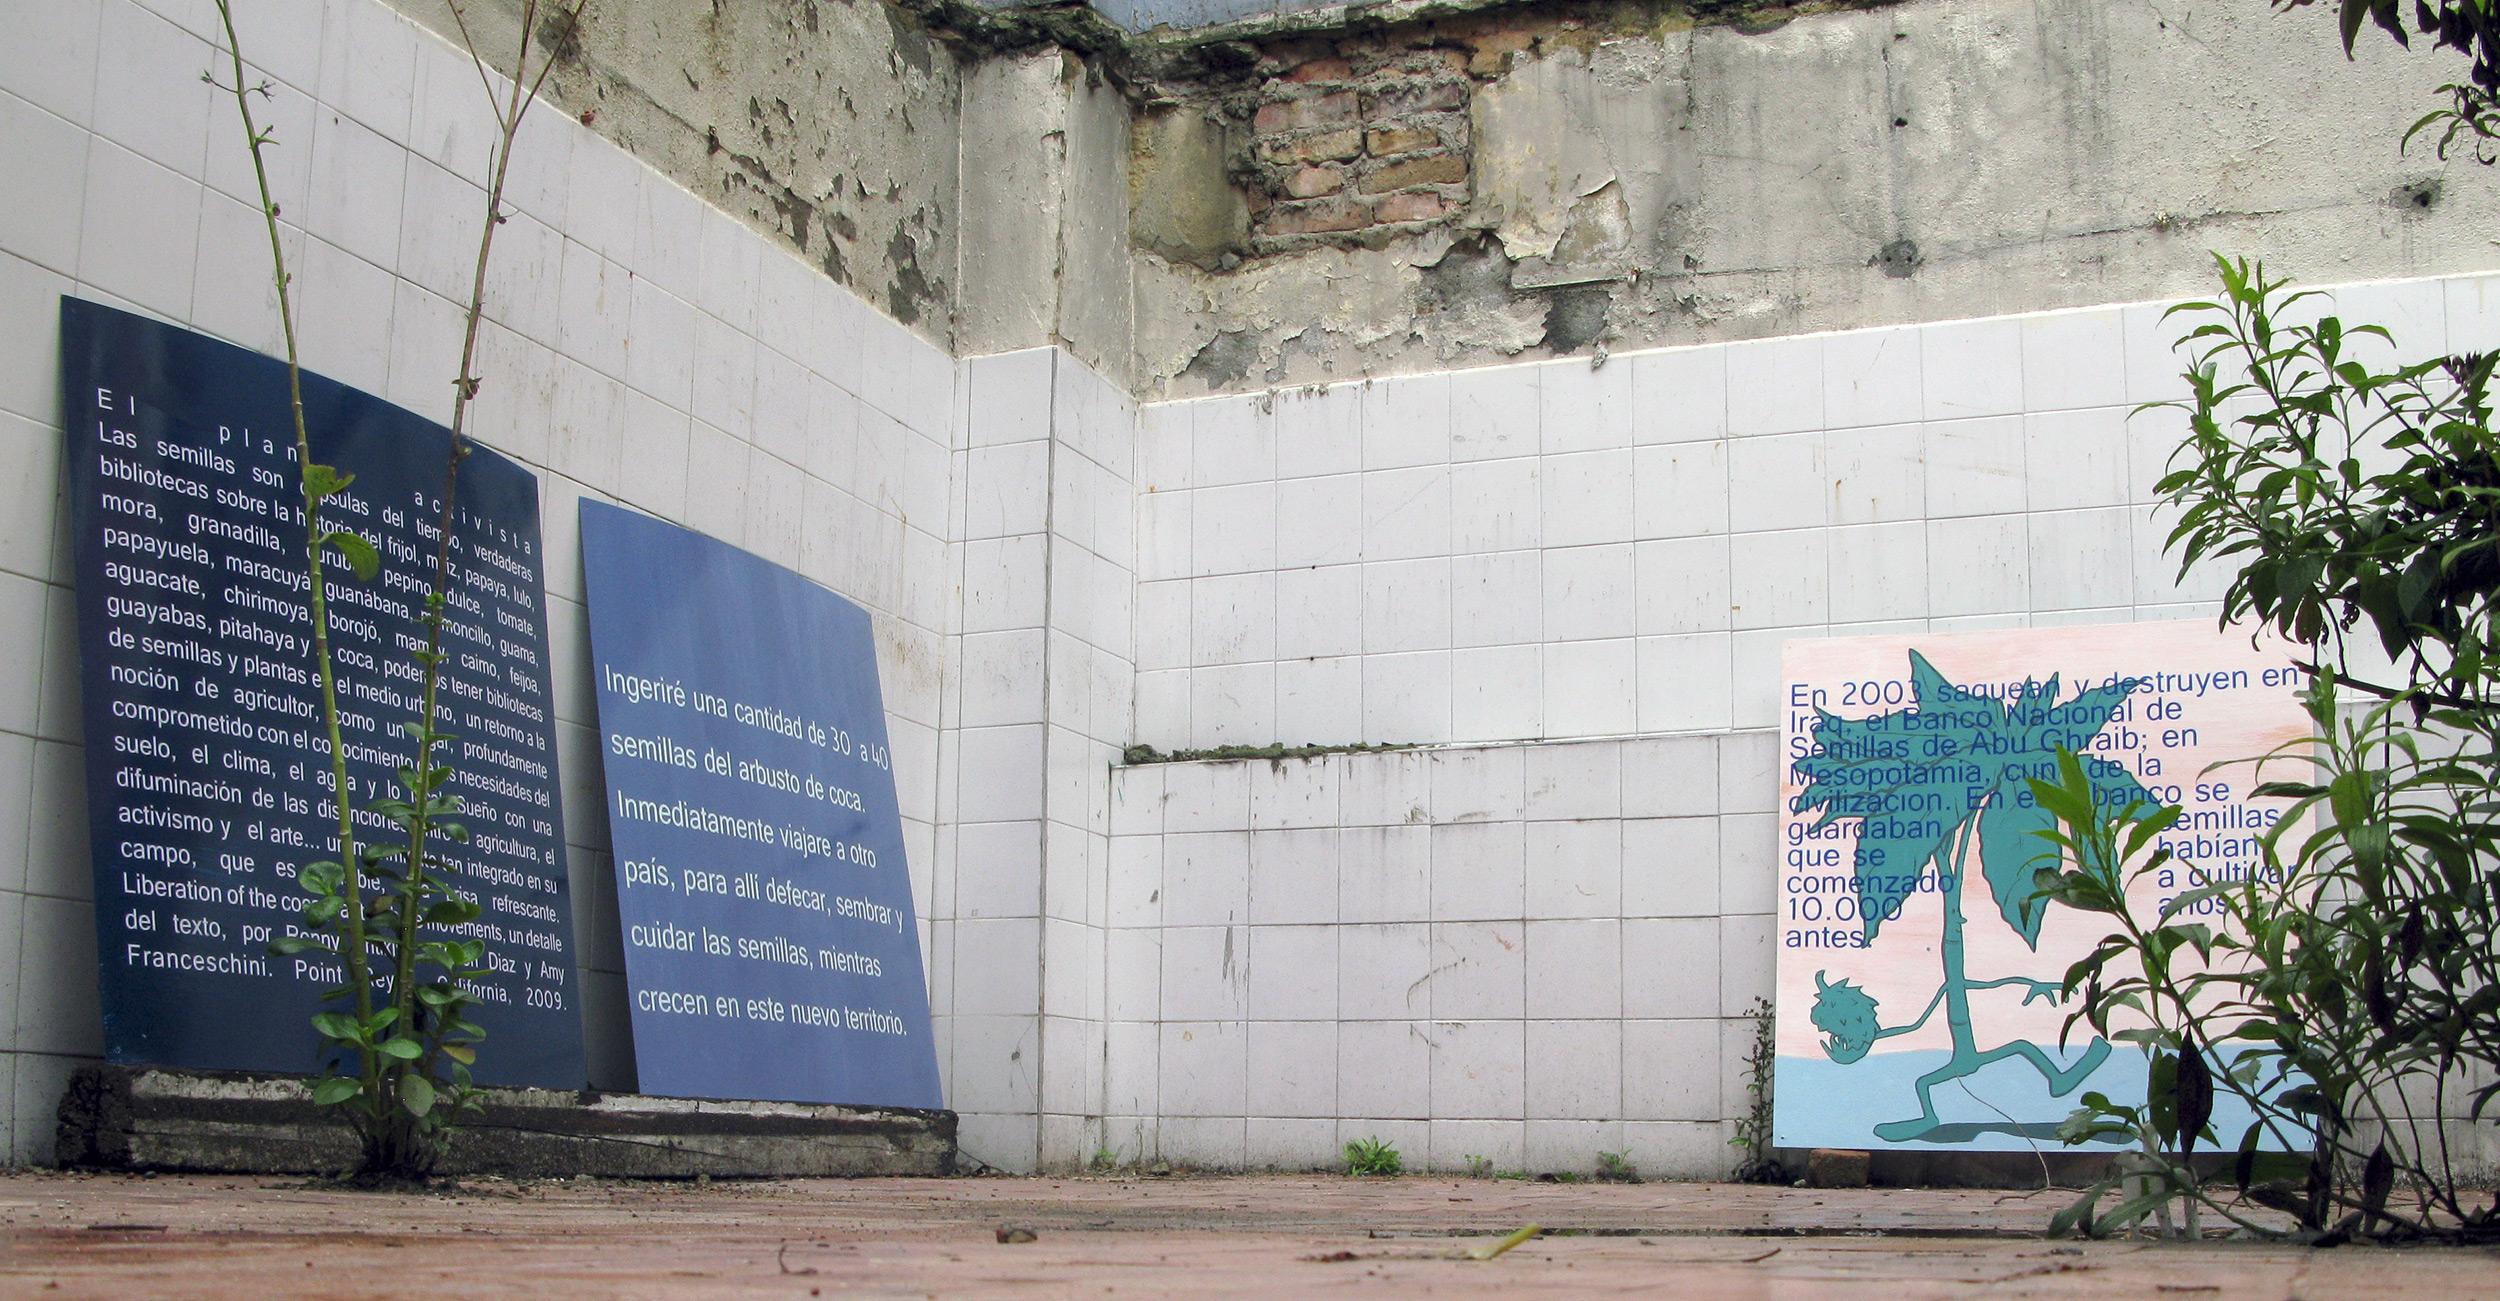 La otra bienal - Agropoética - Wilson Díaz